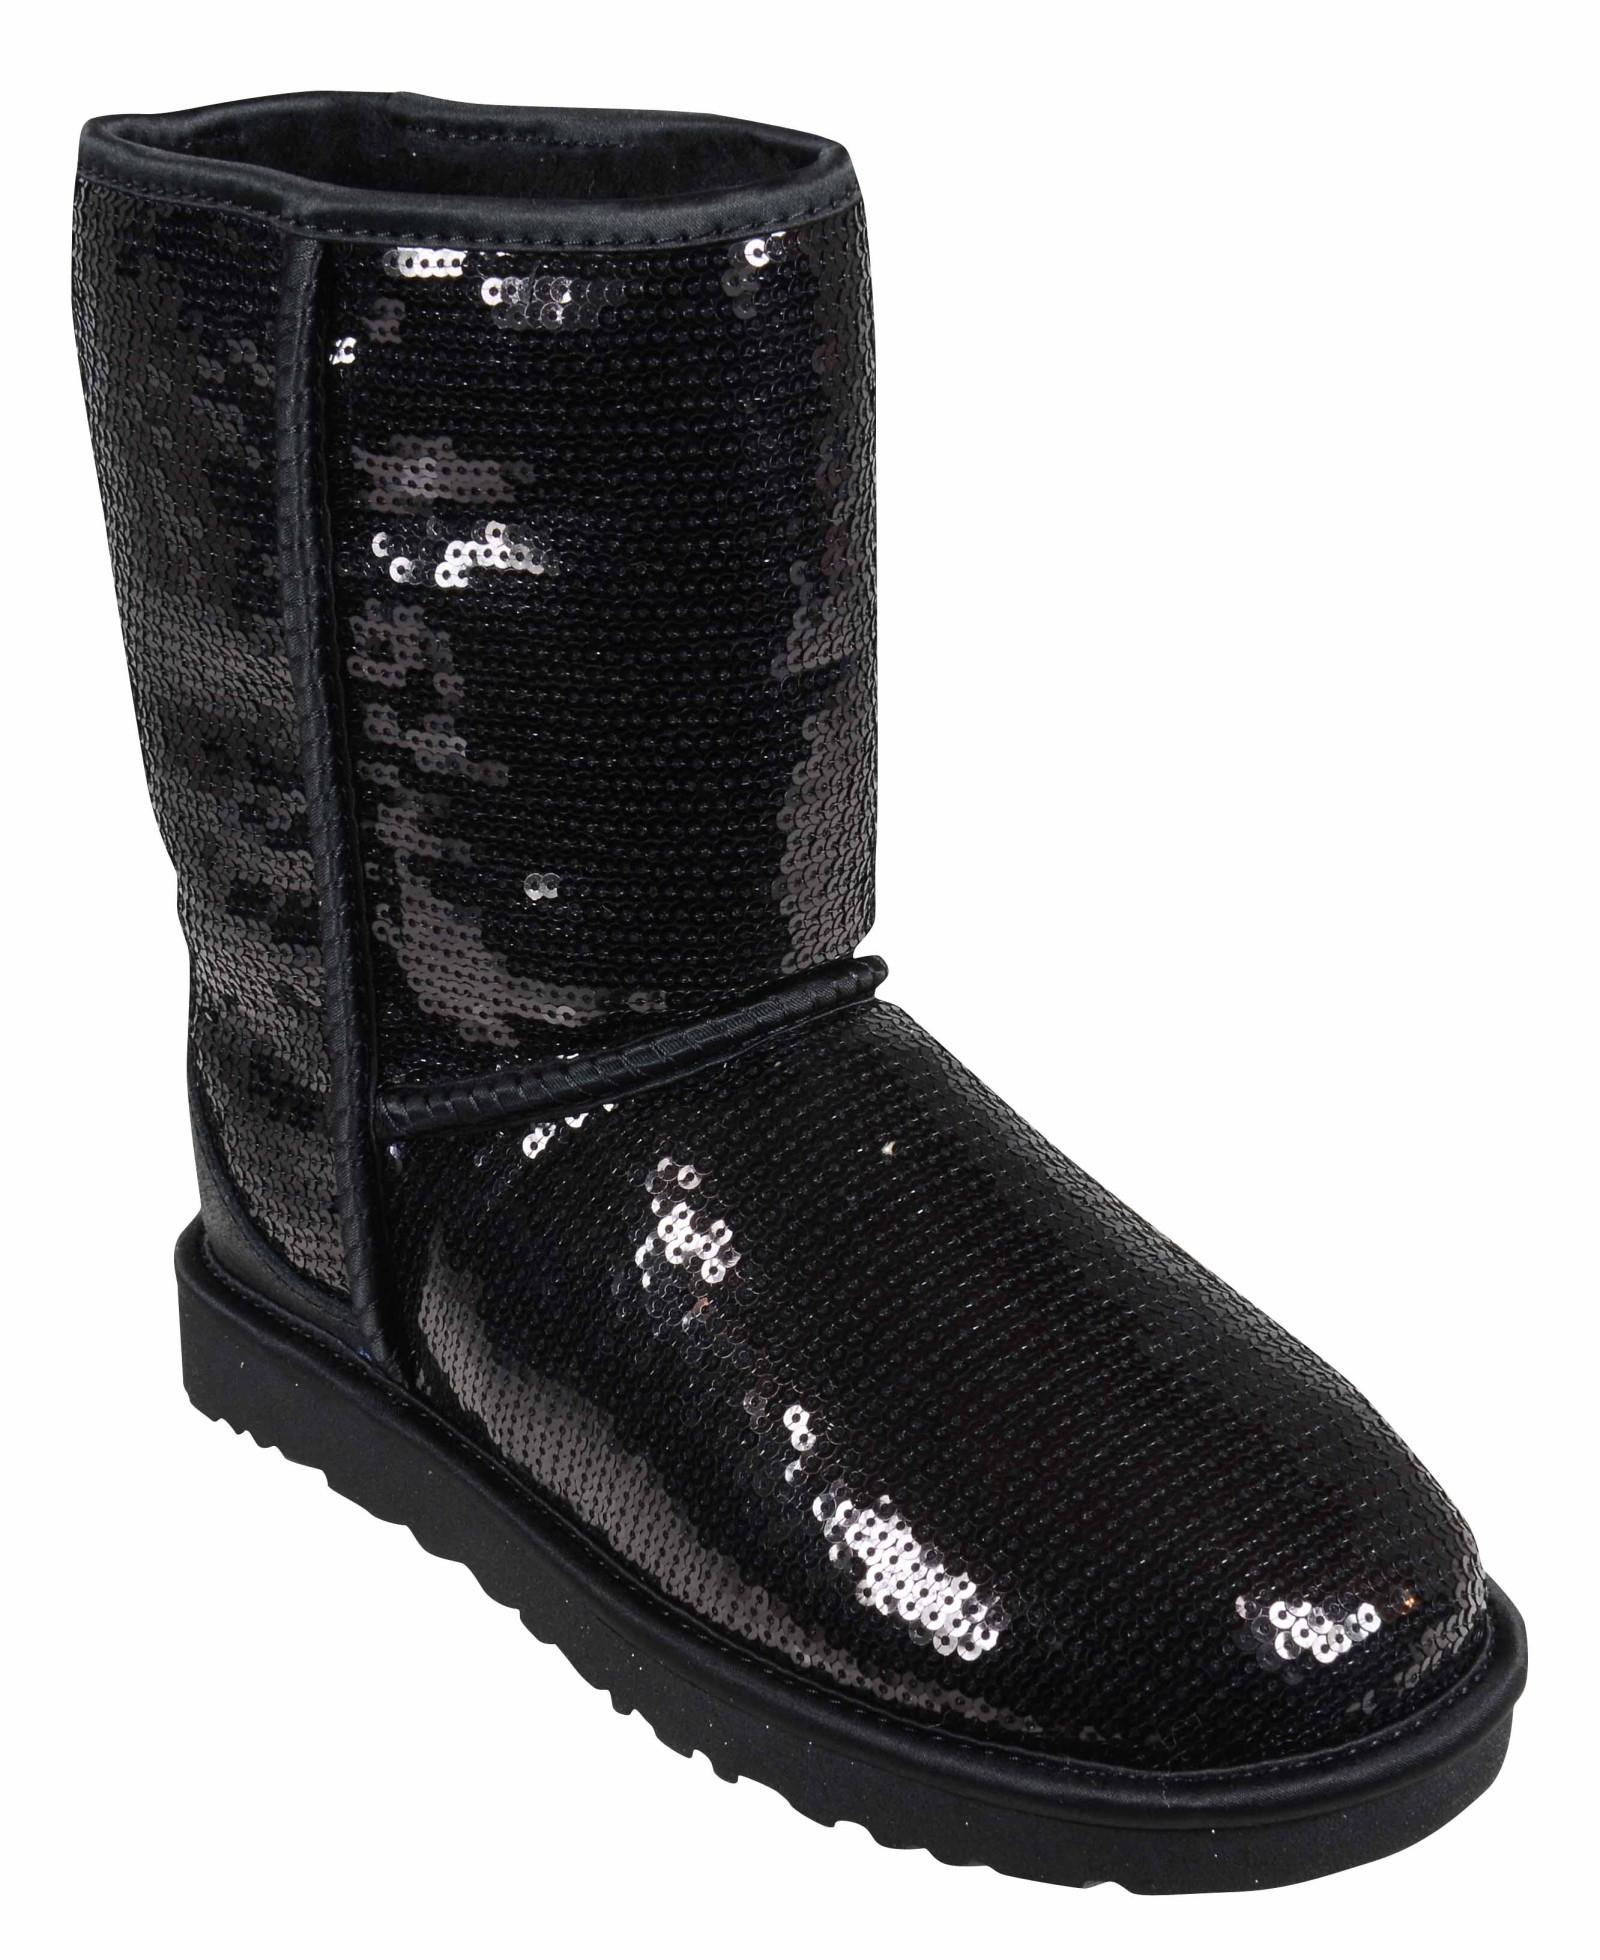 order ugg boots online usa